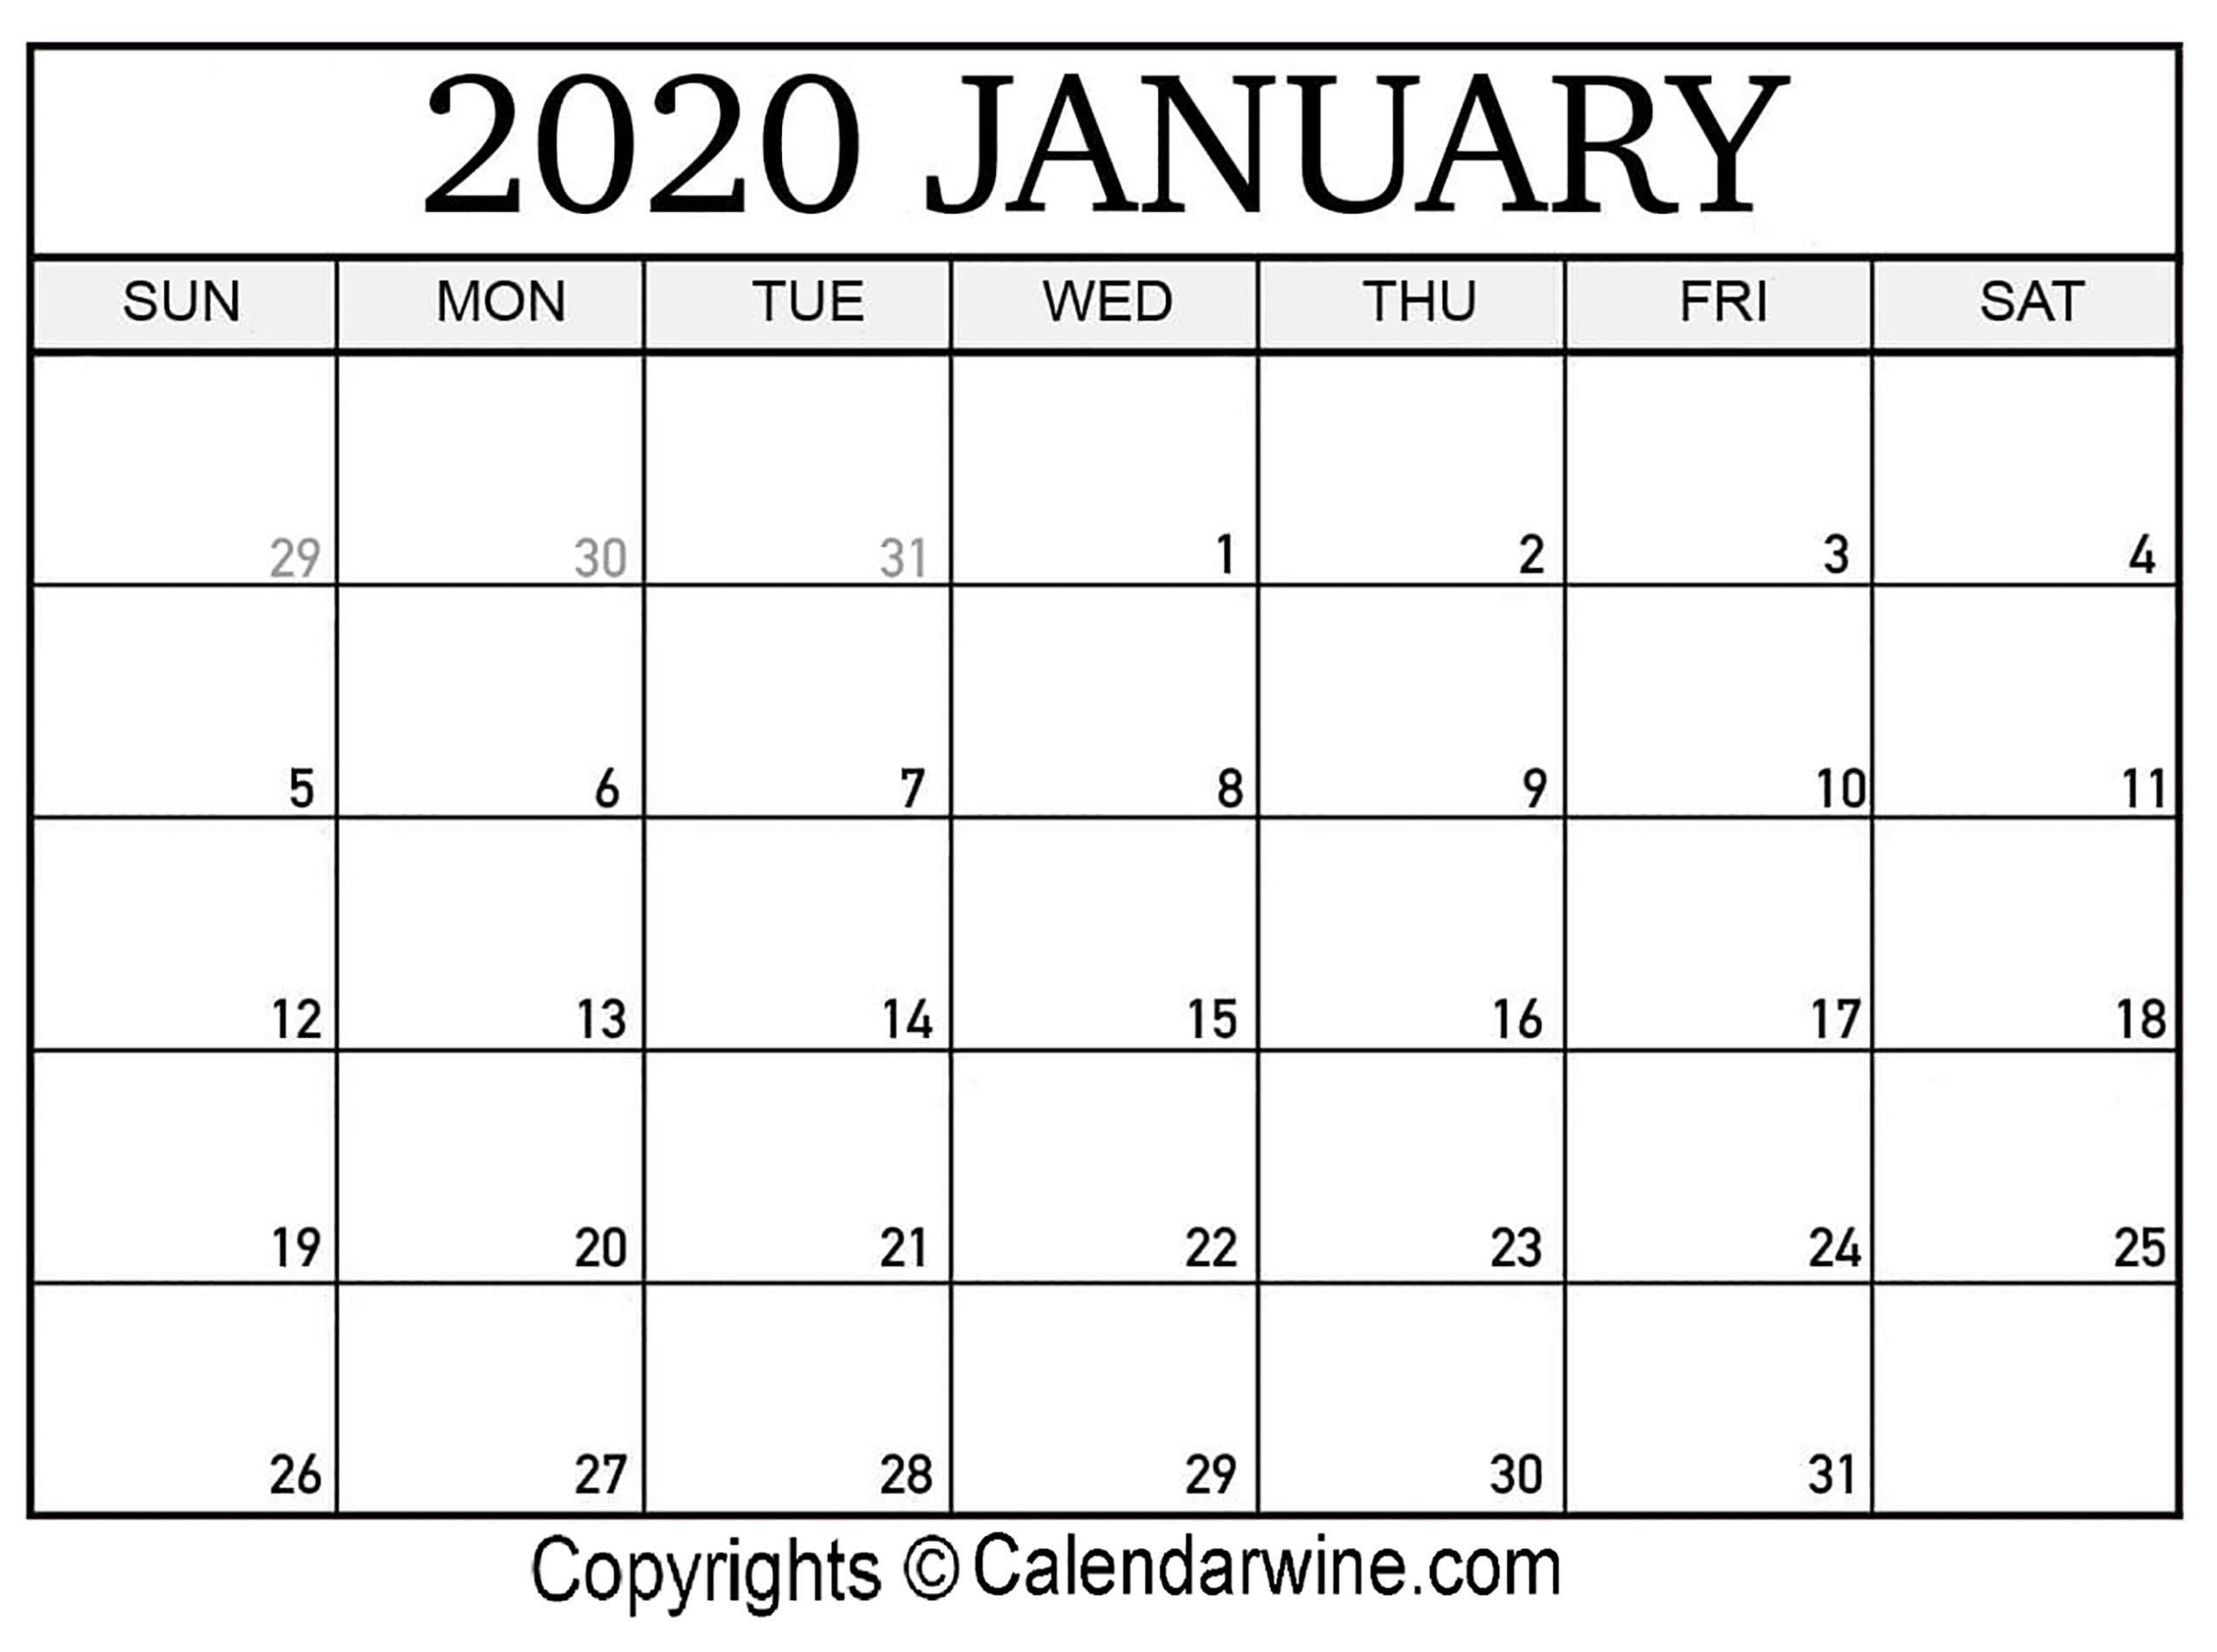 January 2020 Printable Calendar Templates   Calendar Wine